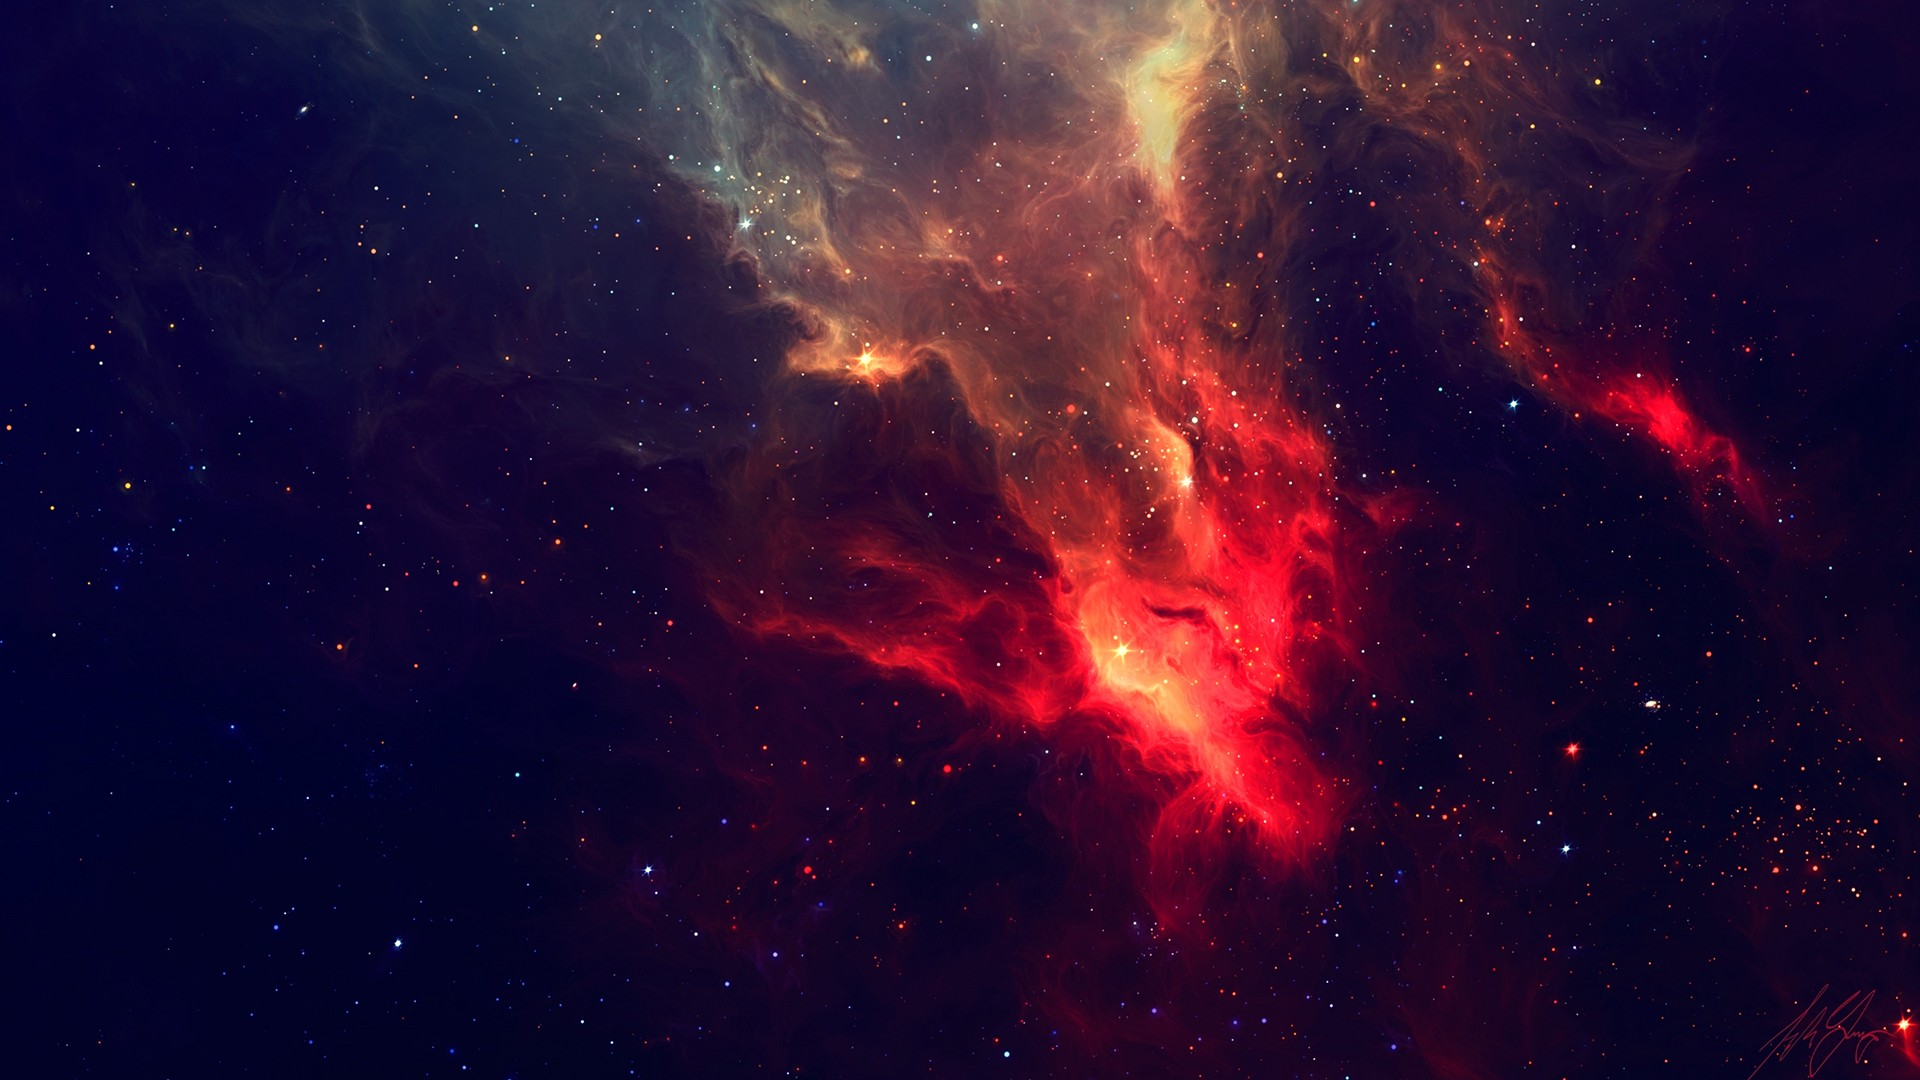 General 1920x1080 space stars nebula TylerCreatesWorlds space art red digital art artwork universe